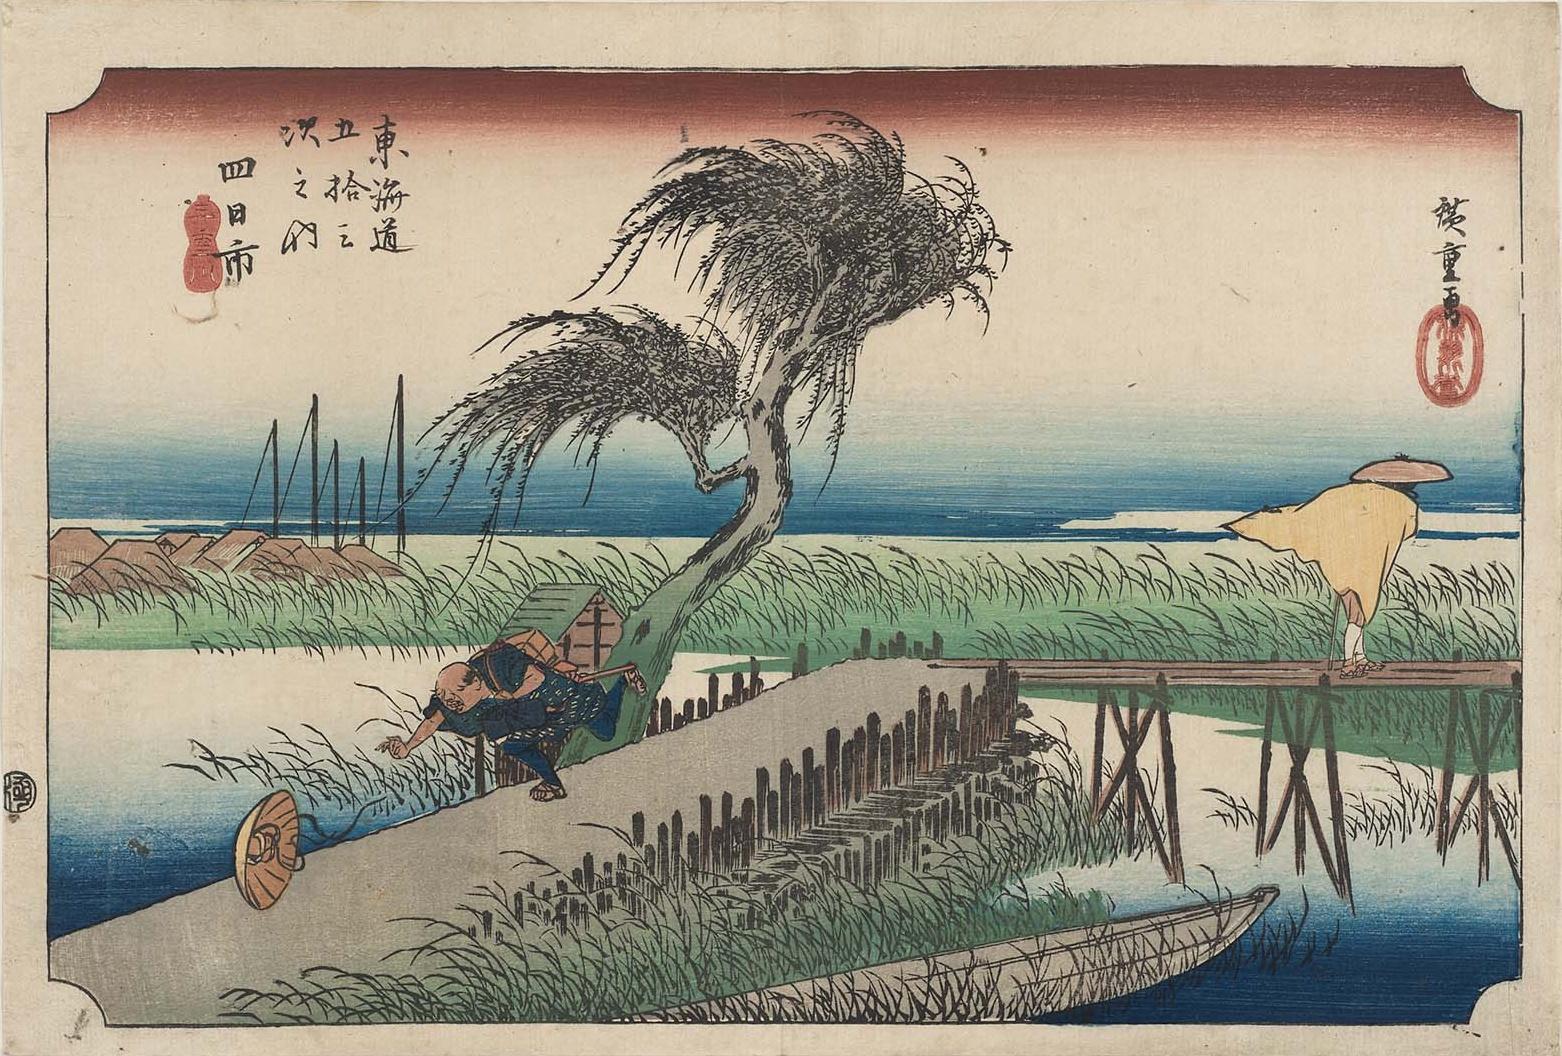 Hiroshige-53-Stations-Hoeido-44-Yokkaichi-MFA-01.jpg